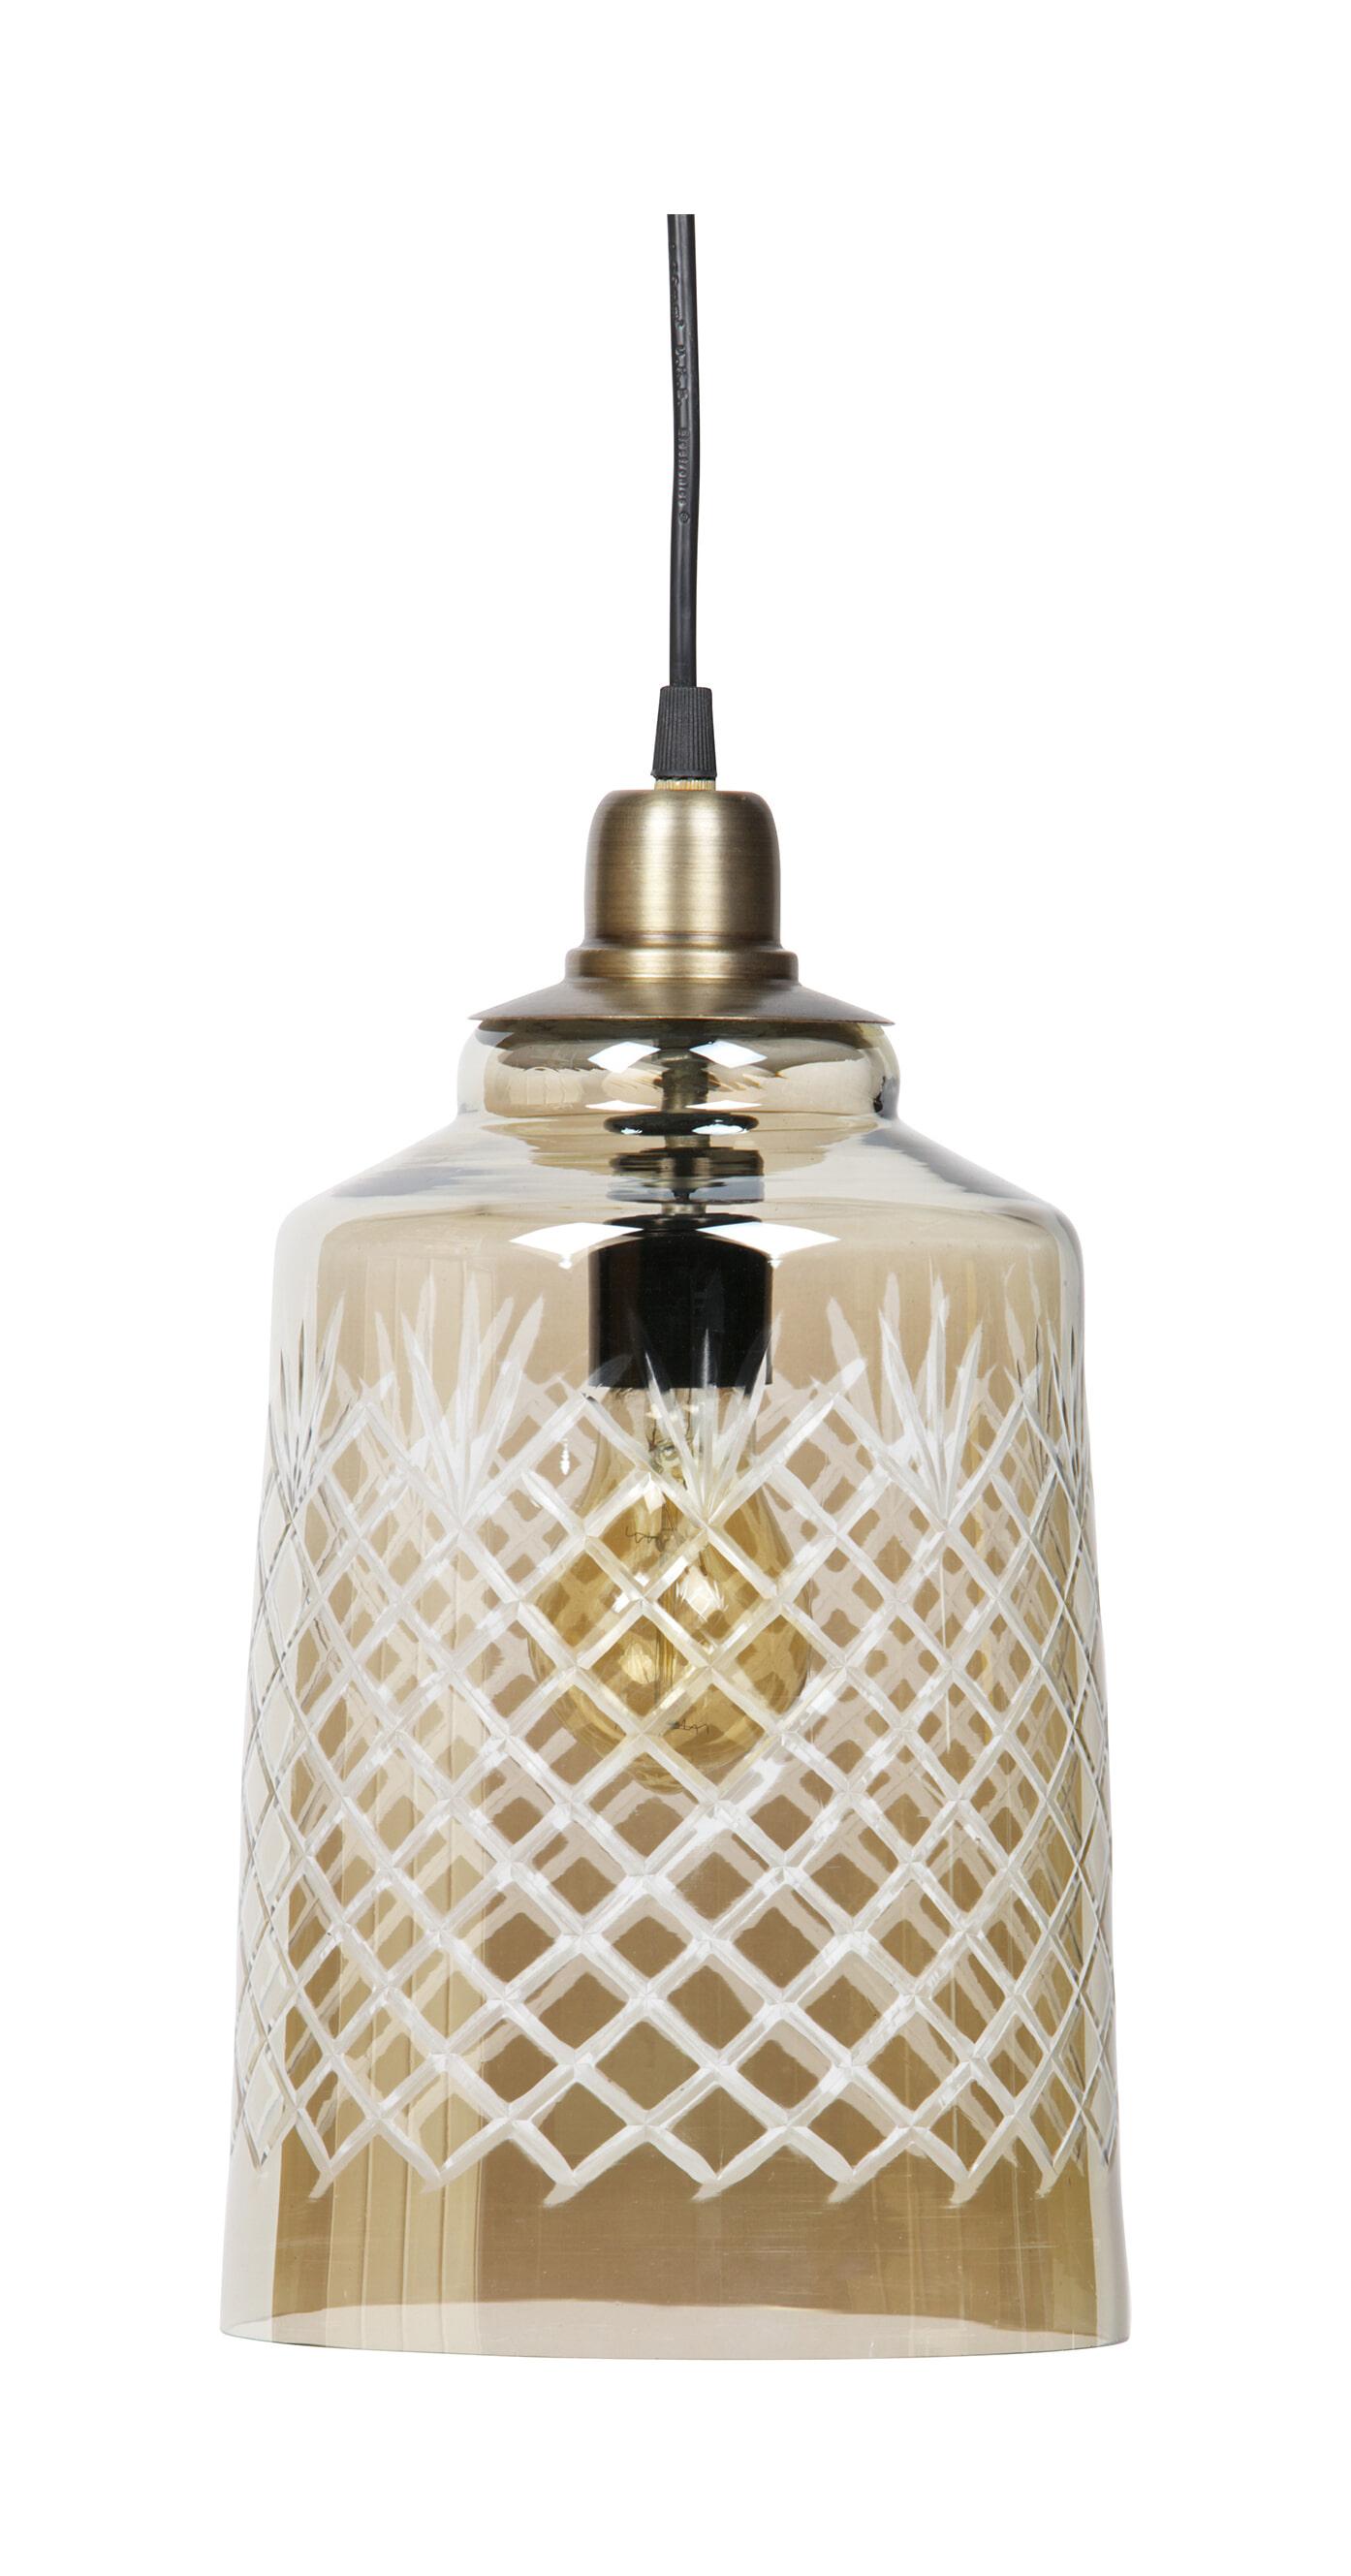 BePureHome Hanglamp 'Engrave' kleur Antique Brass